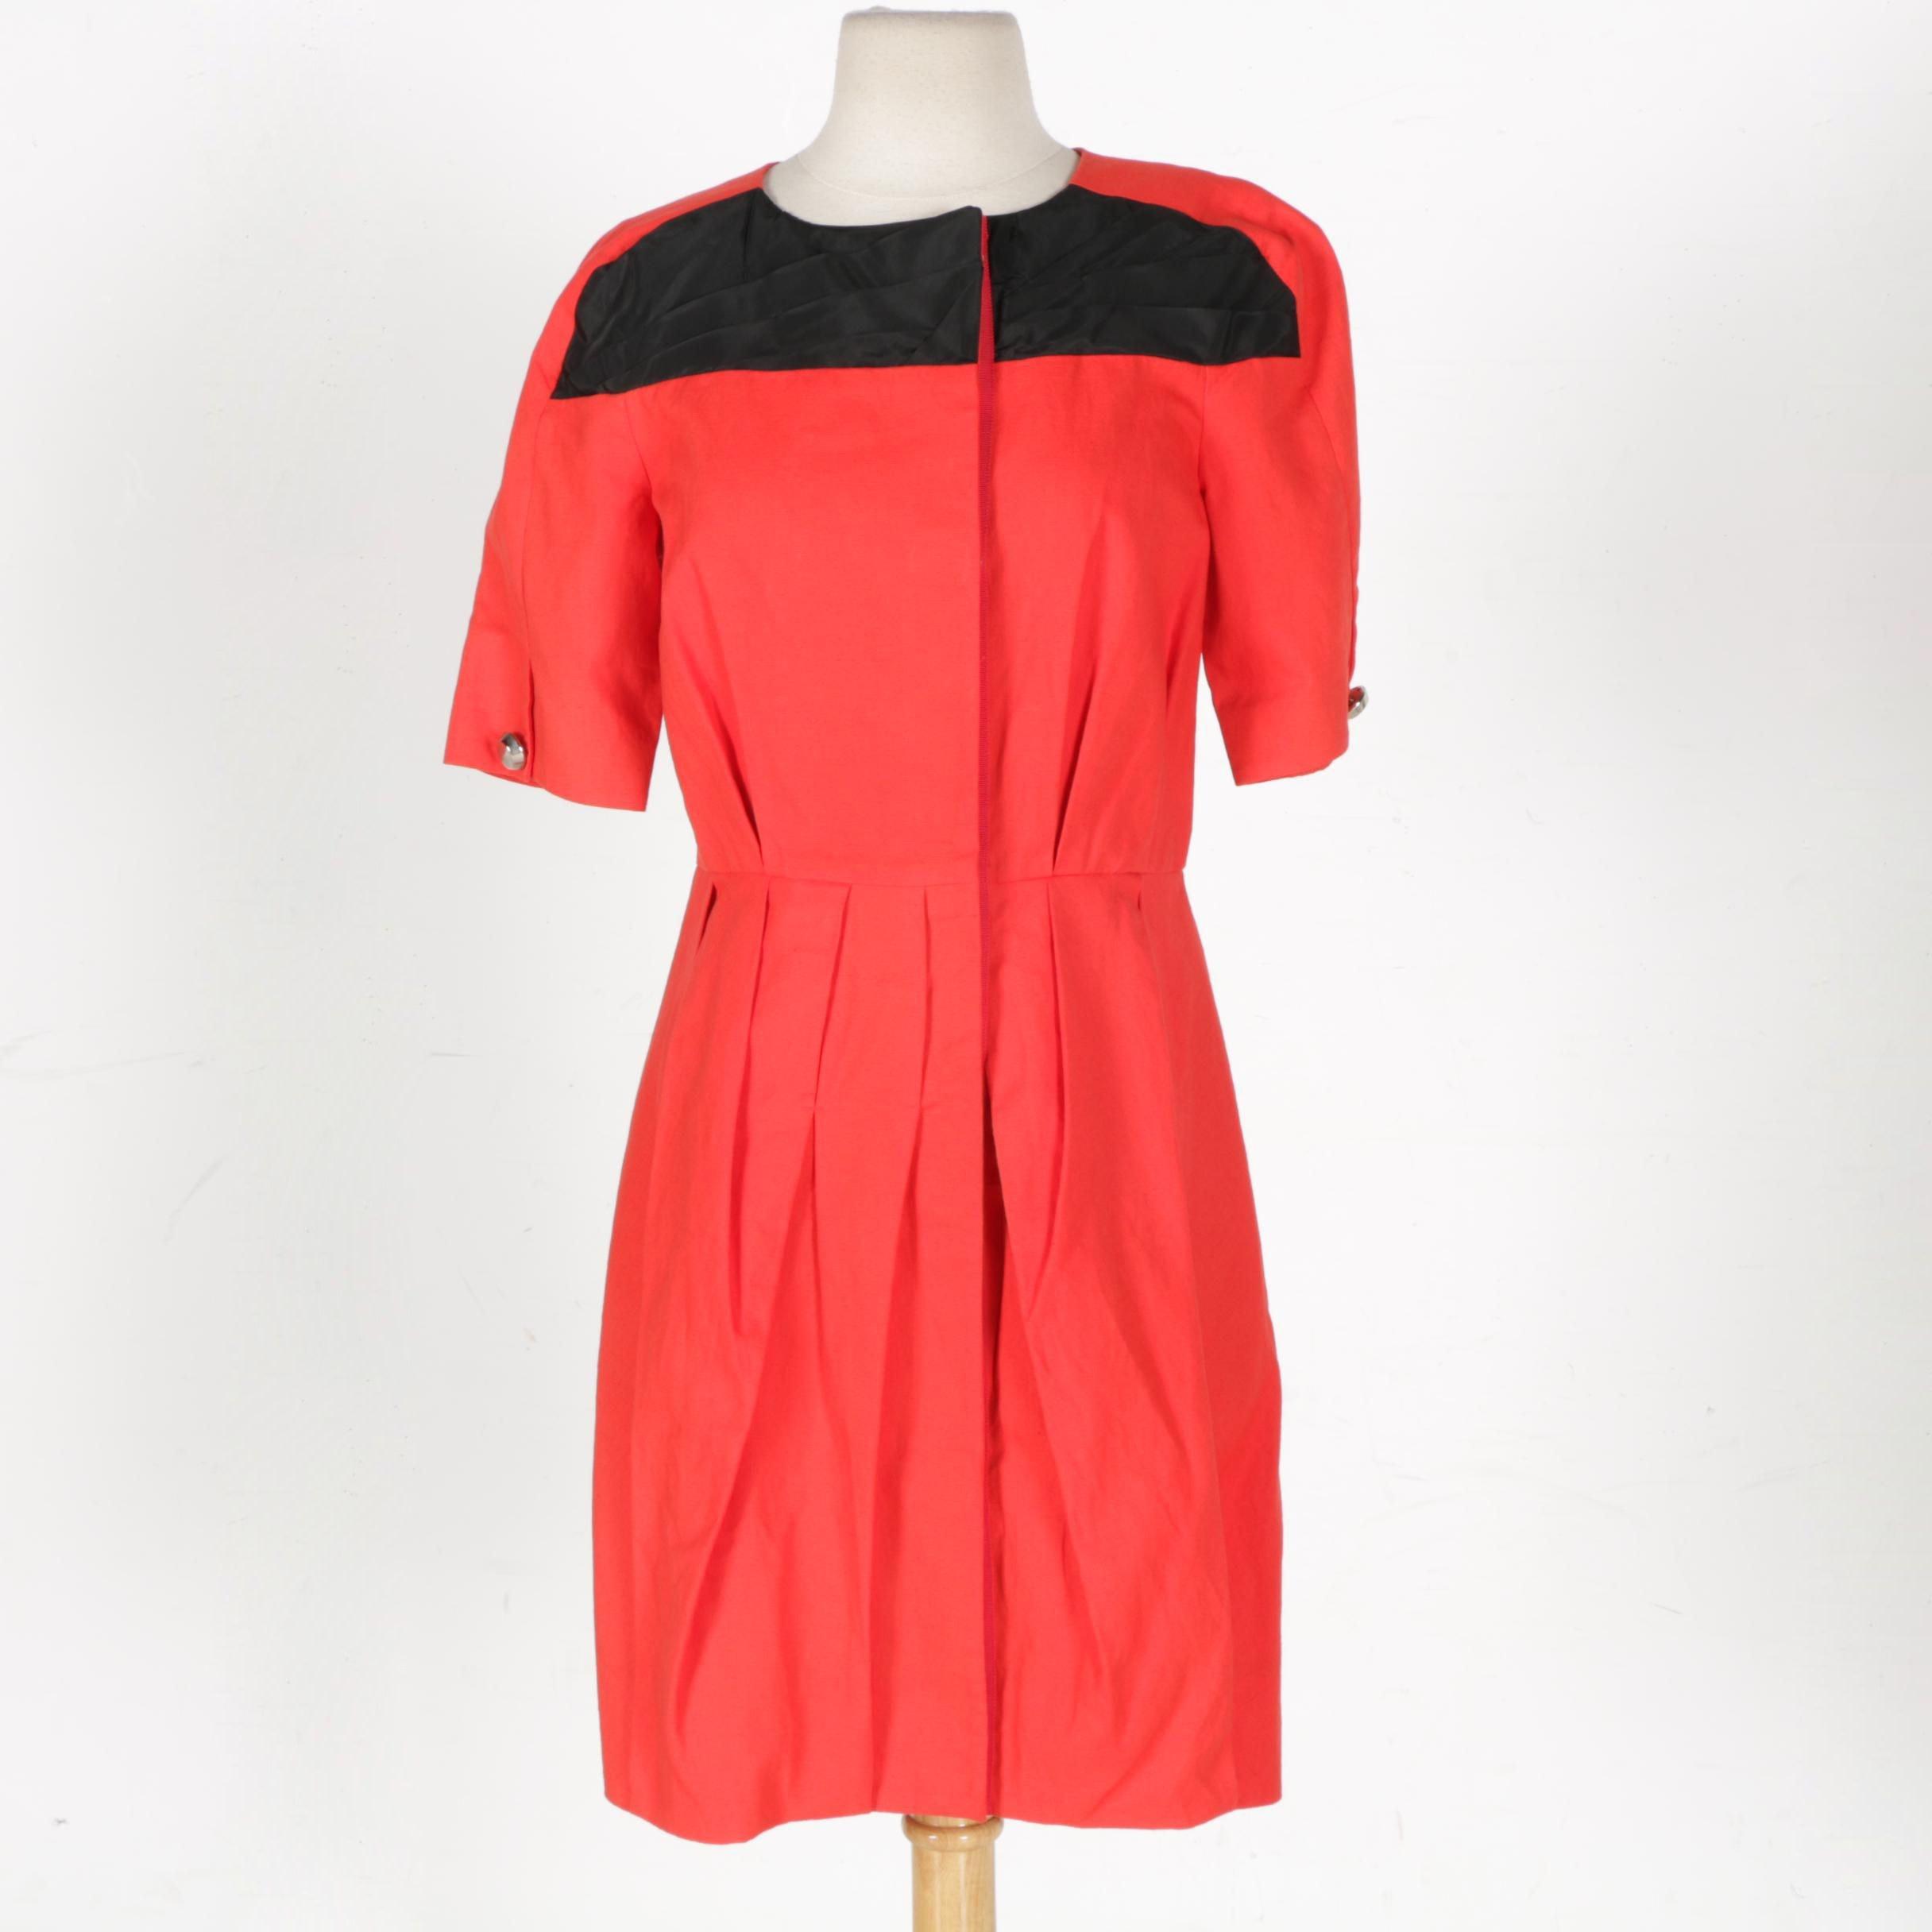 Rachel Roy Red and Black Dress